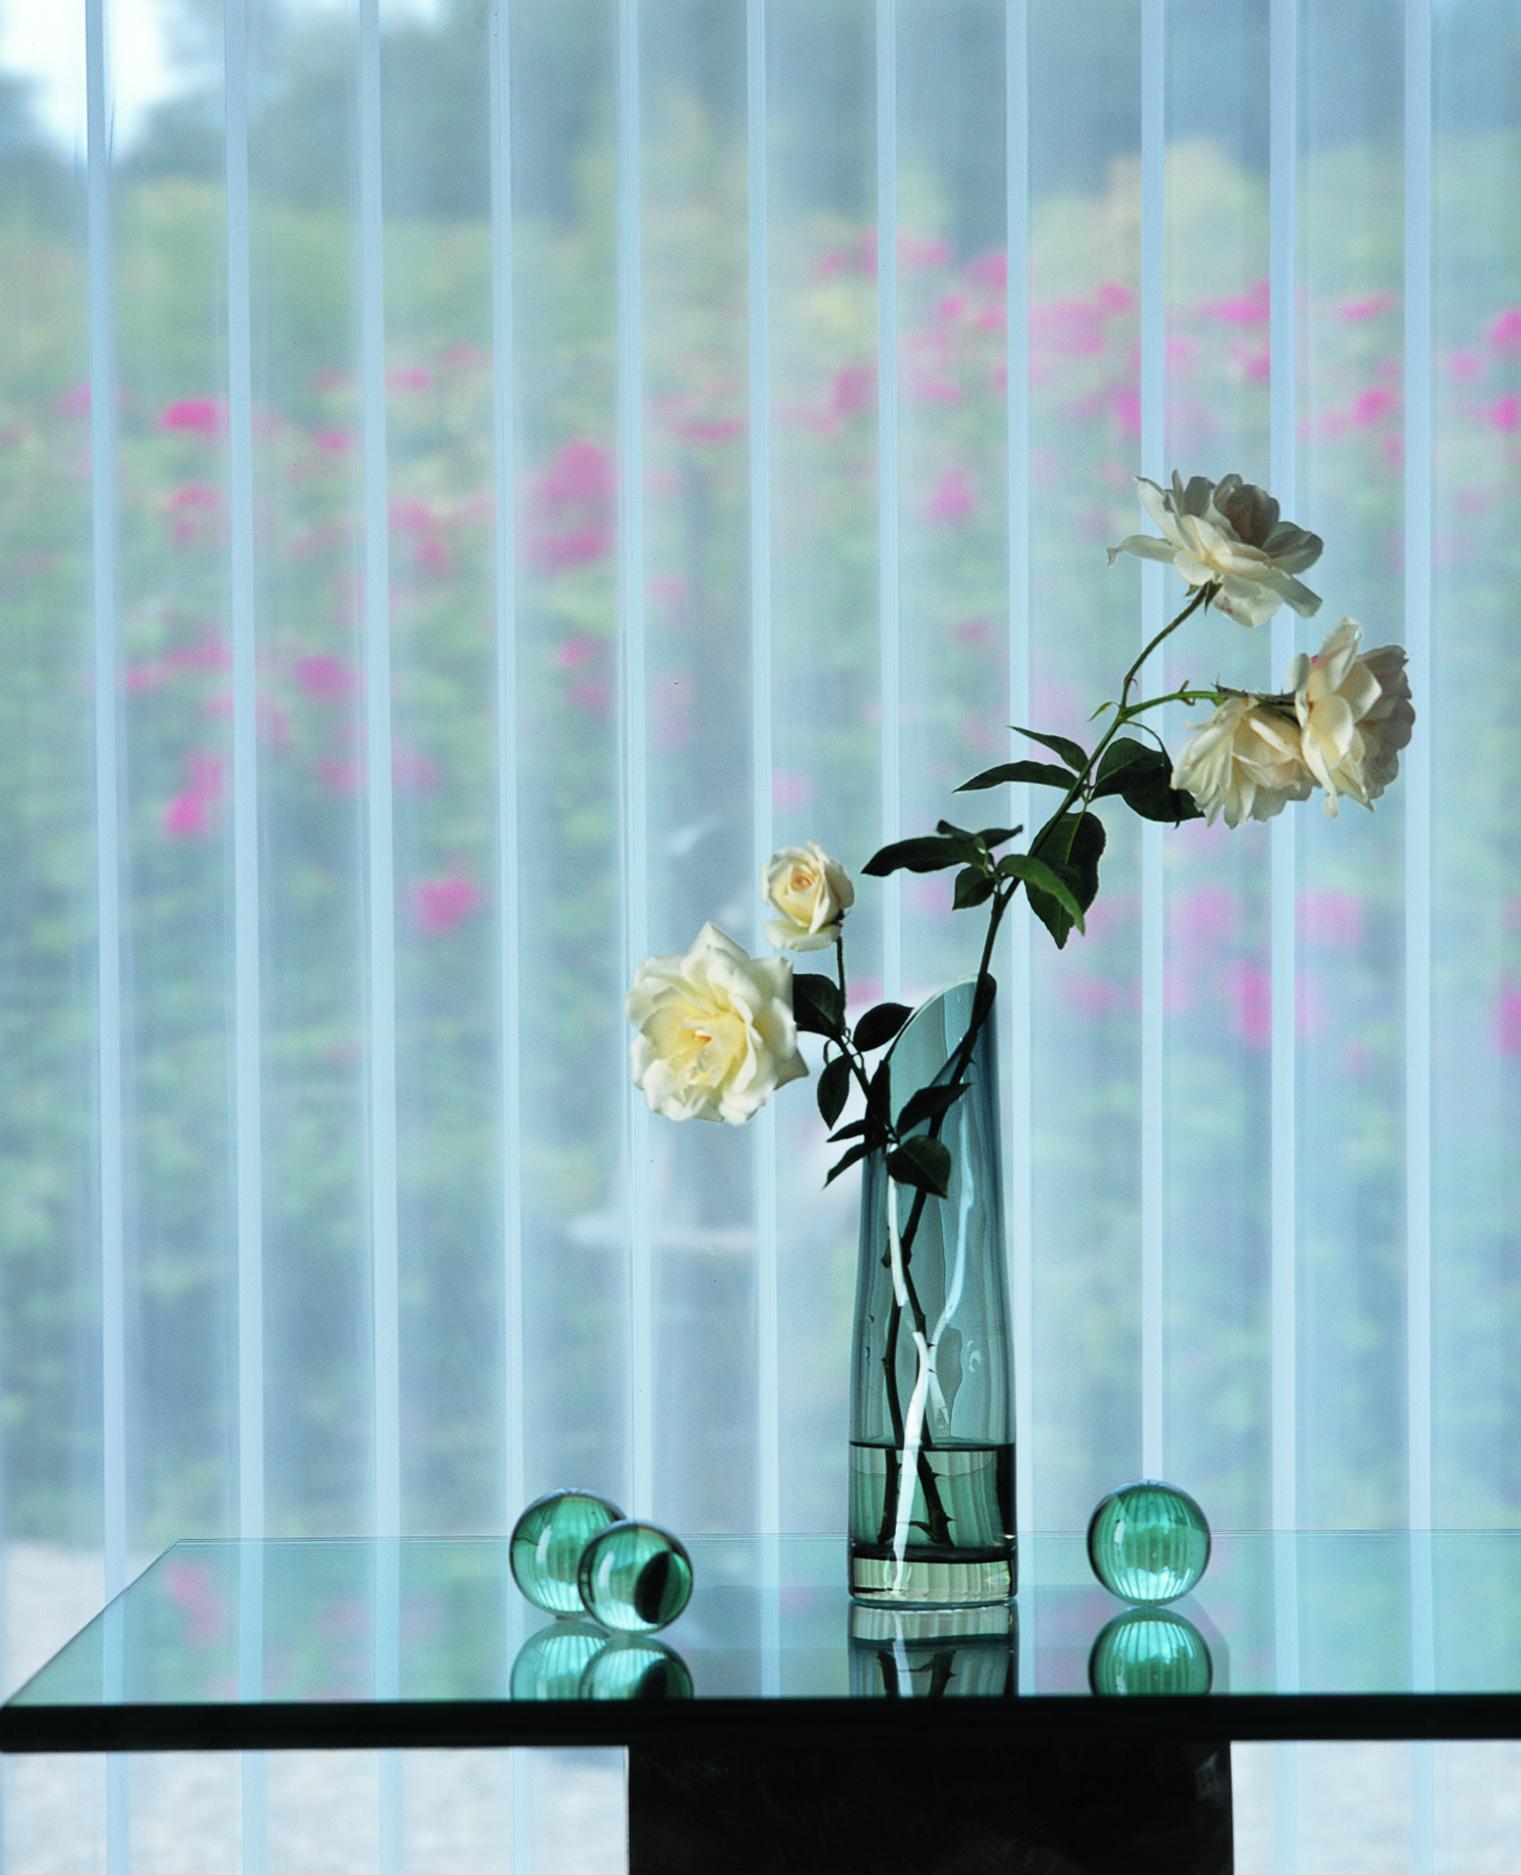 2007_LUM__Flowers_Fabric Detail_Tilted.jpeg